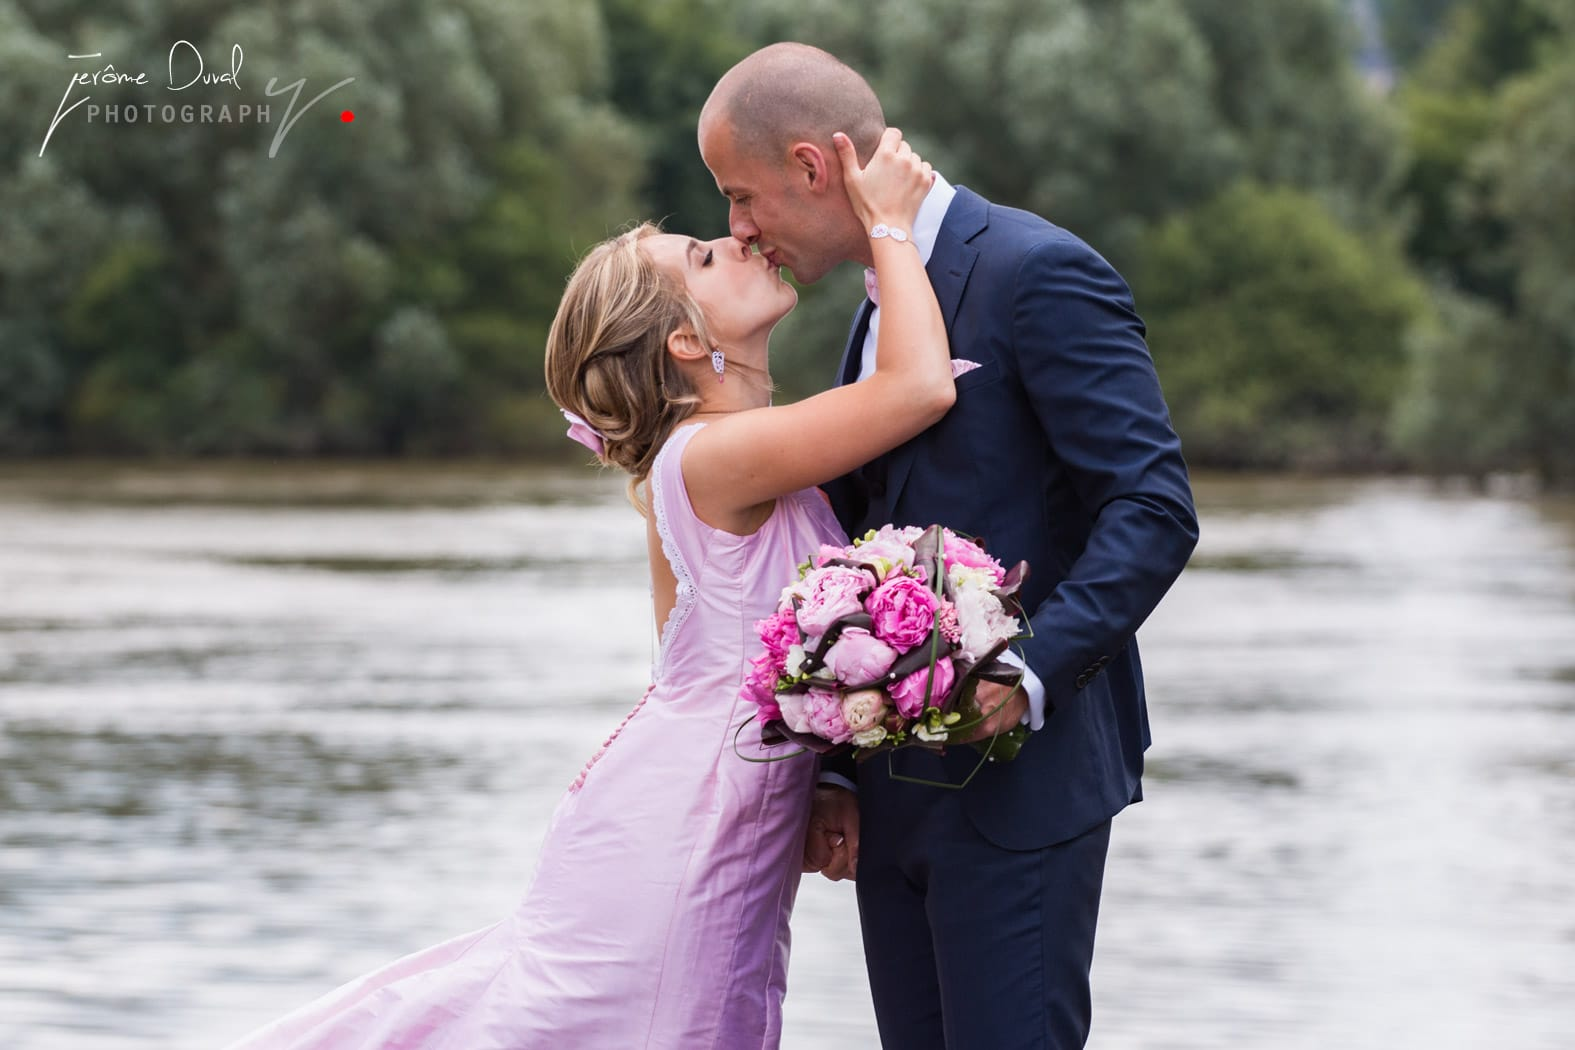 Baisé de la mariée